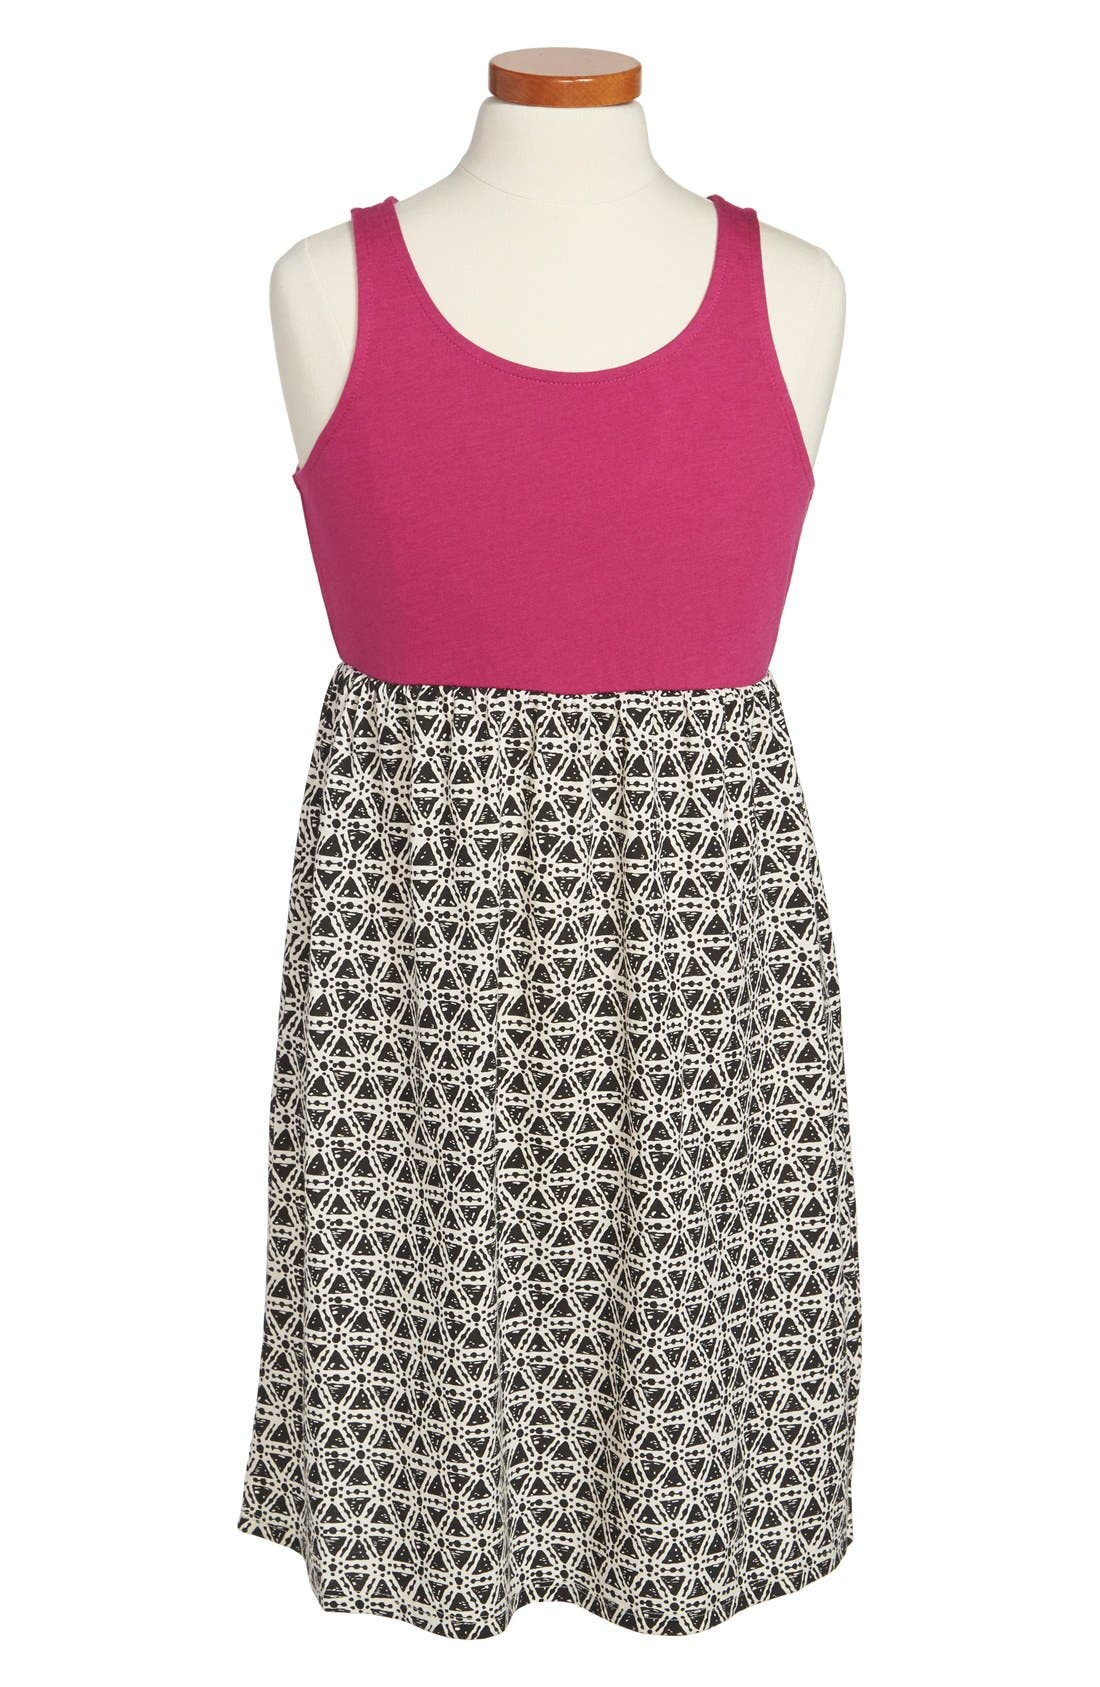 Main Image - Roxy 'Beaming Shadow' Sleeveless Dress (Big Girls)